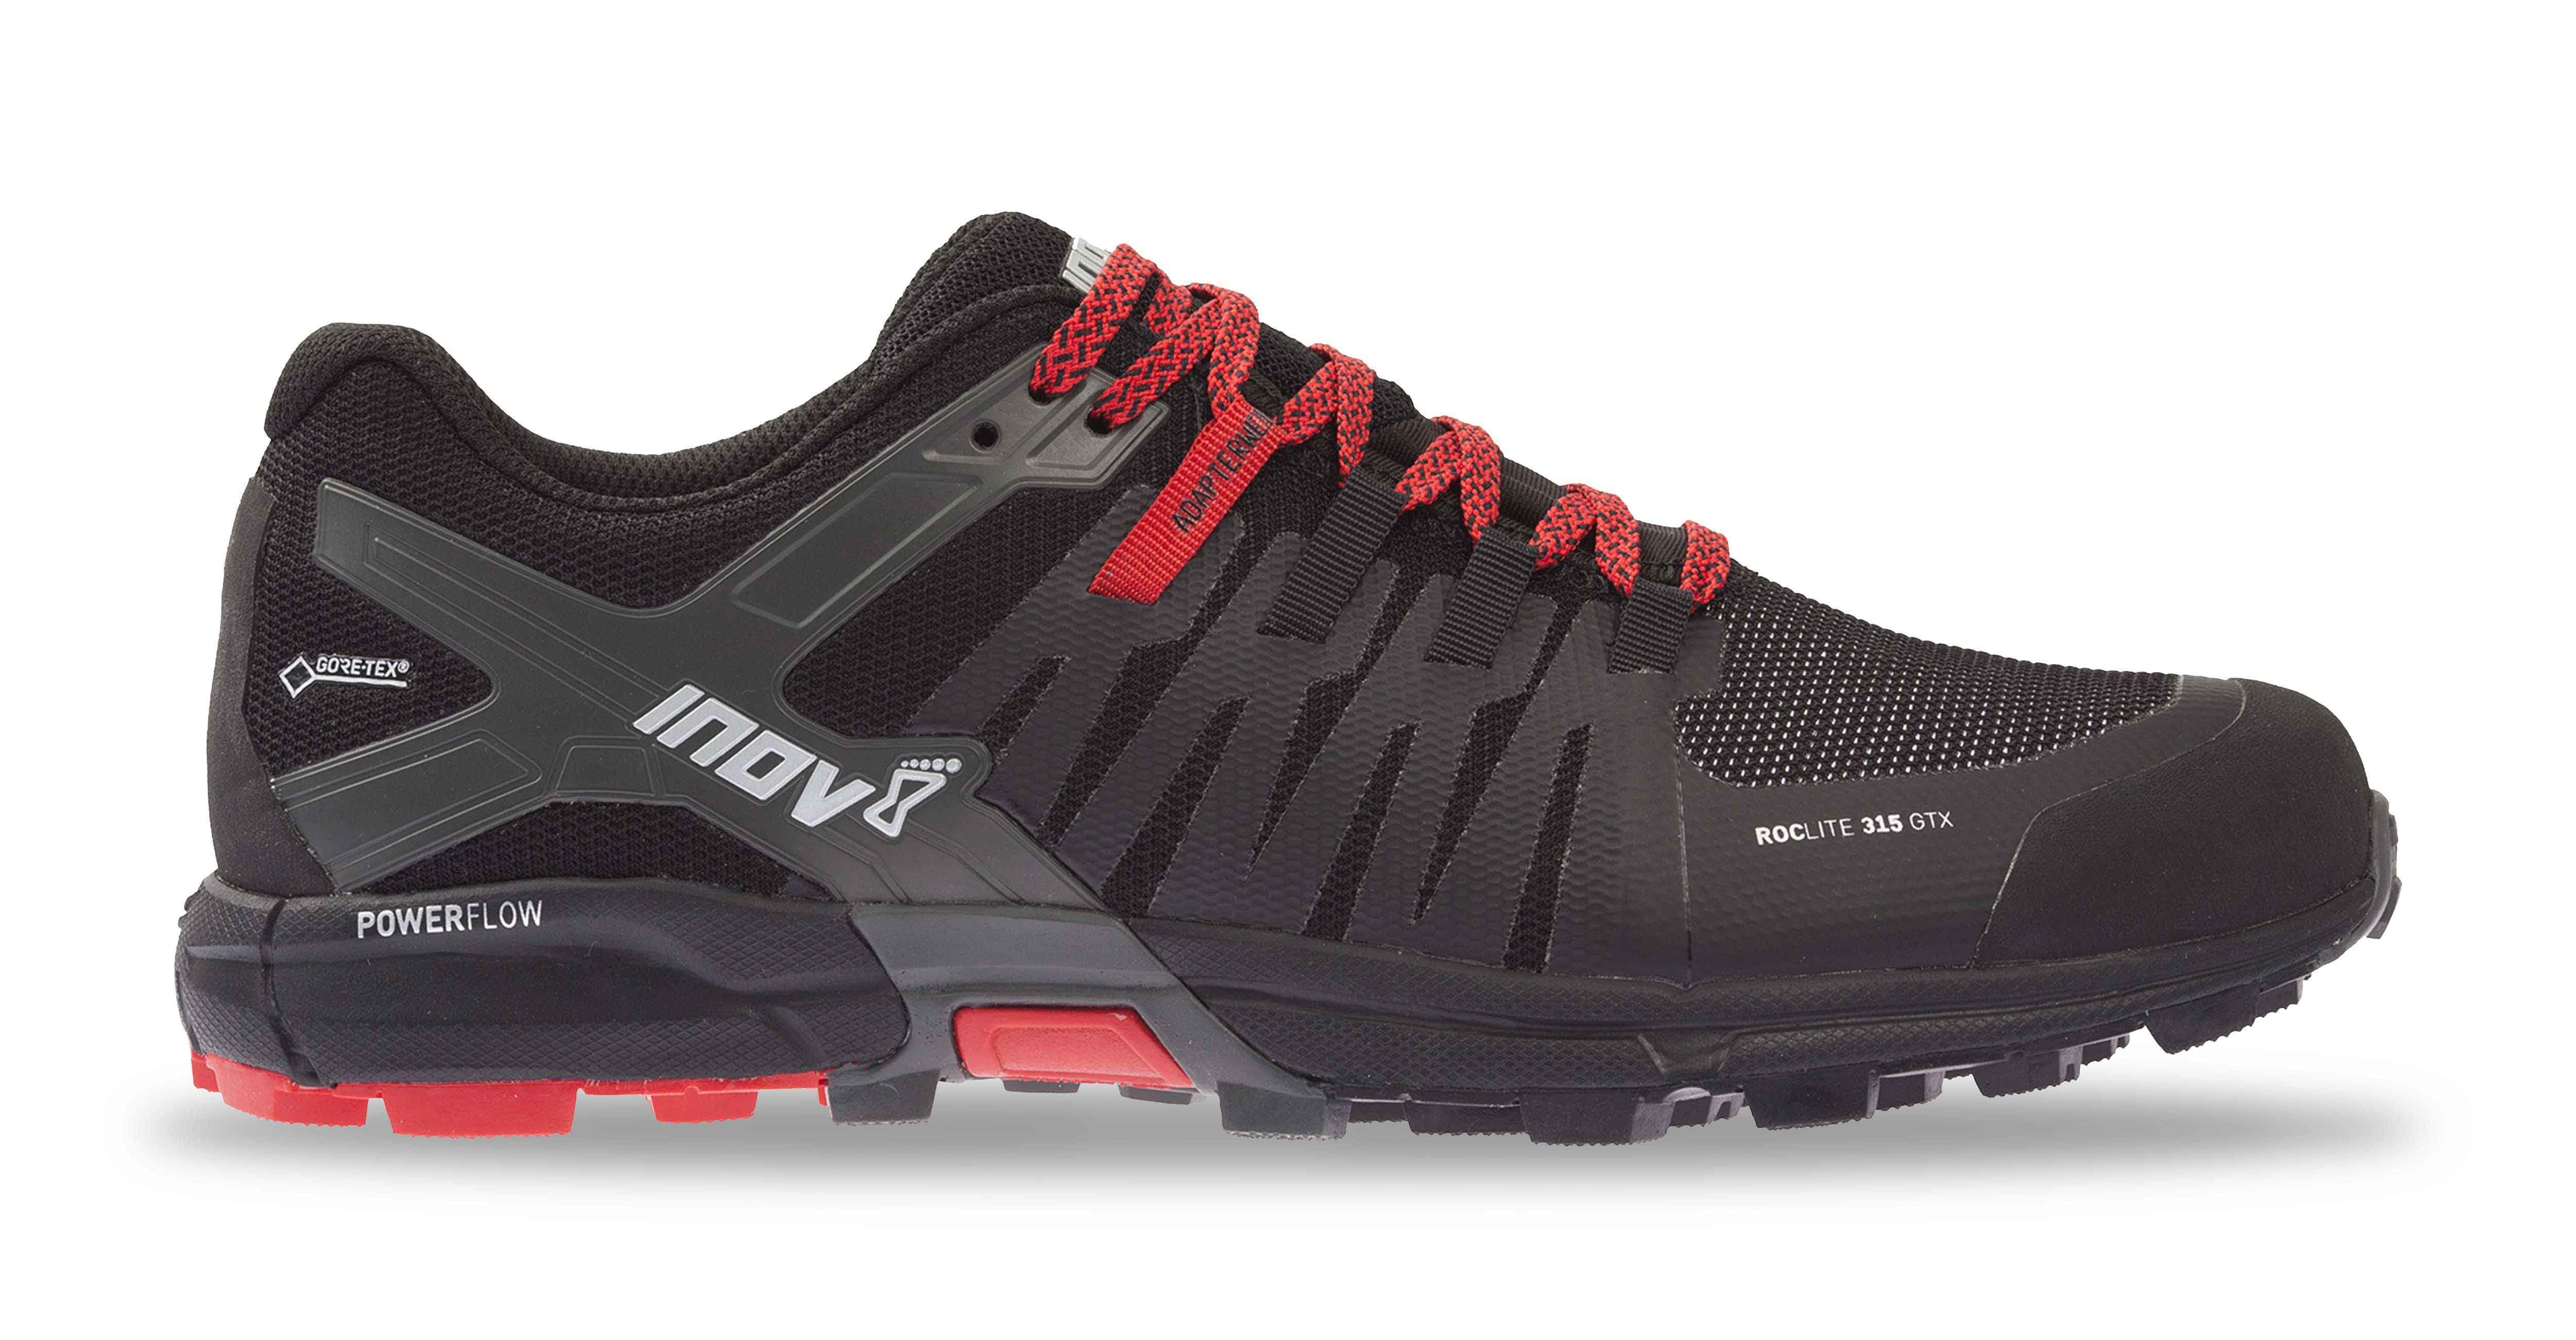 sports shoes 916e9 2ea17 Inov8 Roclite 315 GTX Trail Running Shoes - Men's